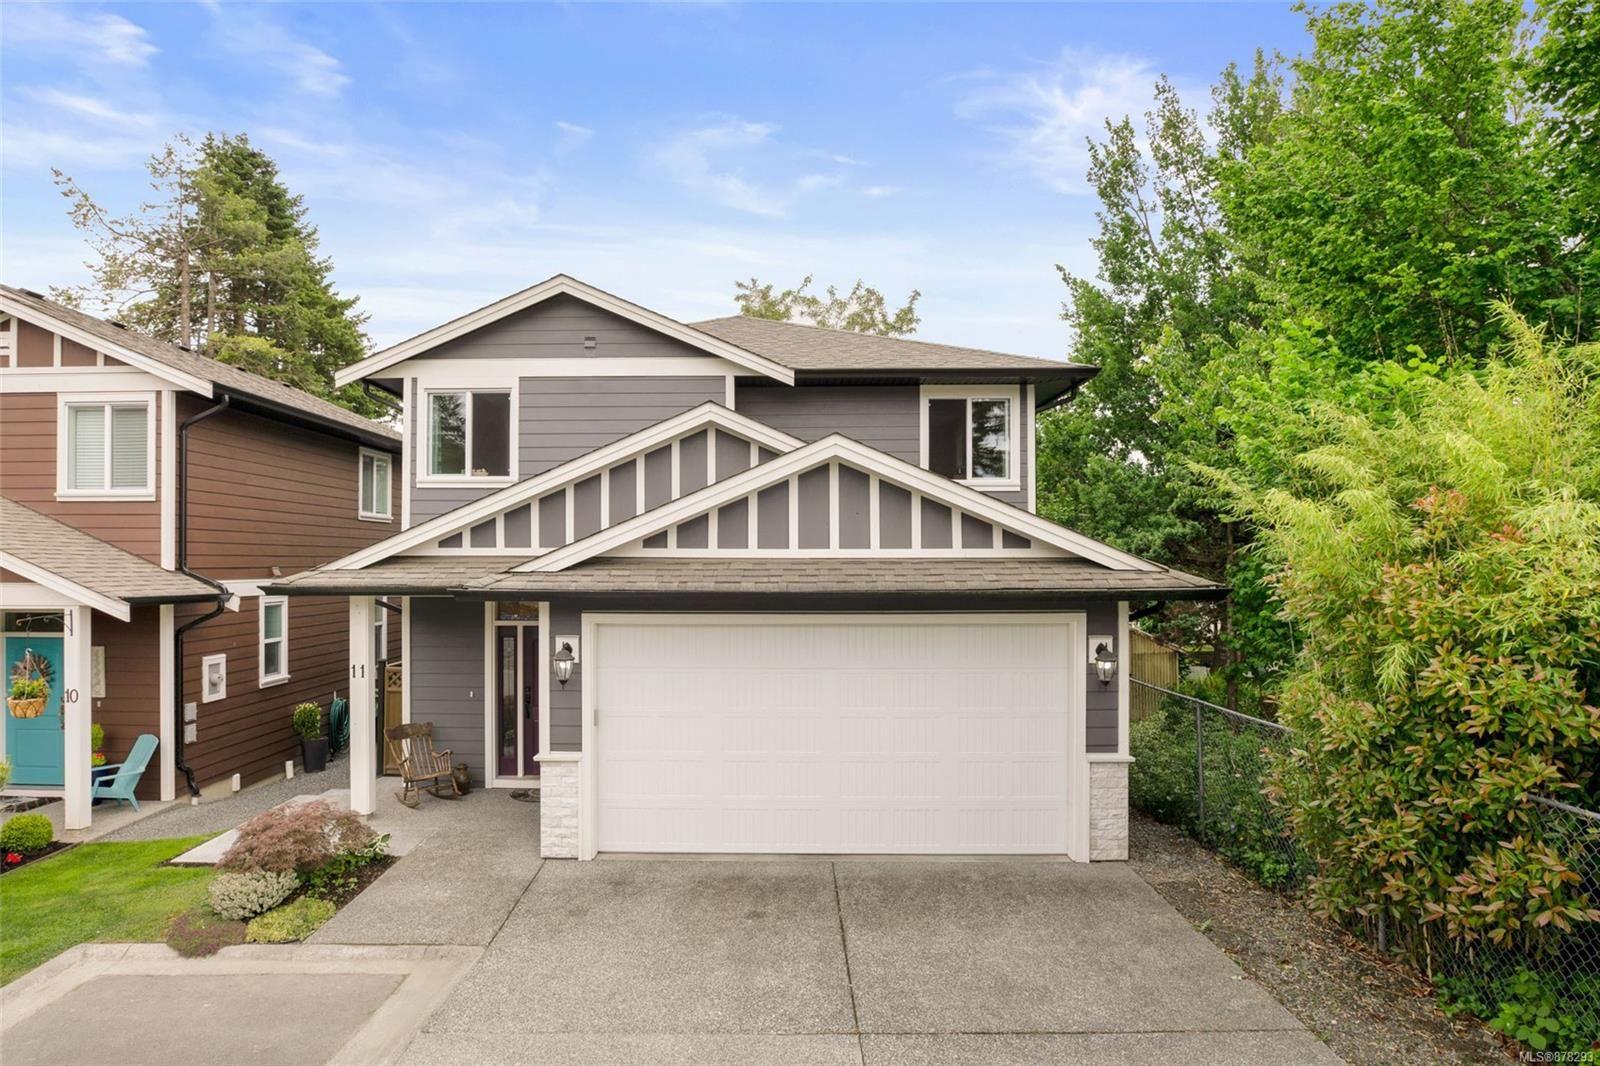 Main Photo: 11 3205 Gibbins Rd in : Du West Duncan House for sale (Duncan)  : MLS®# 878293